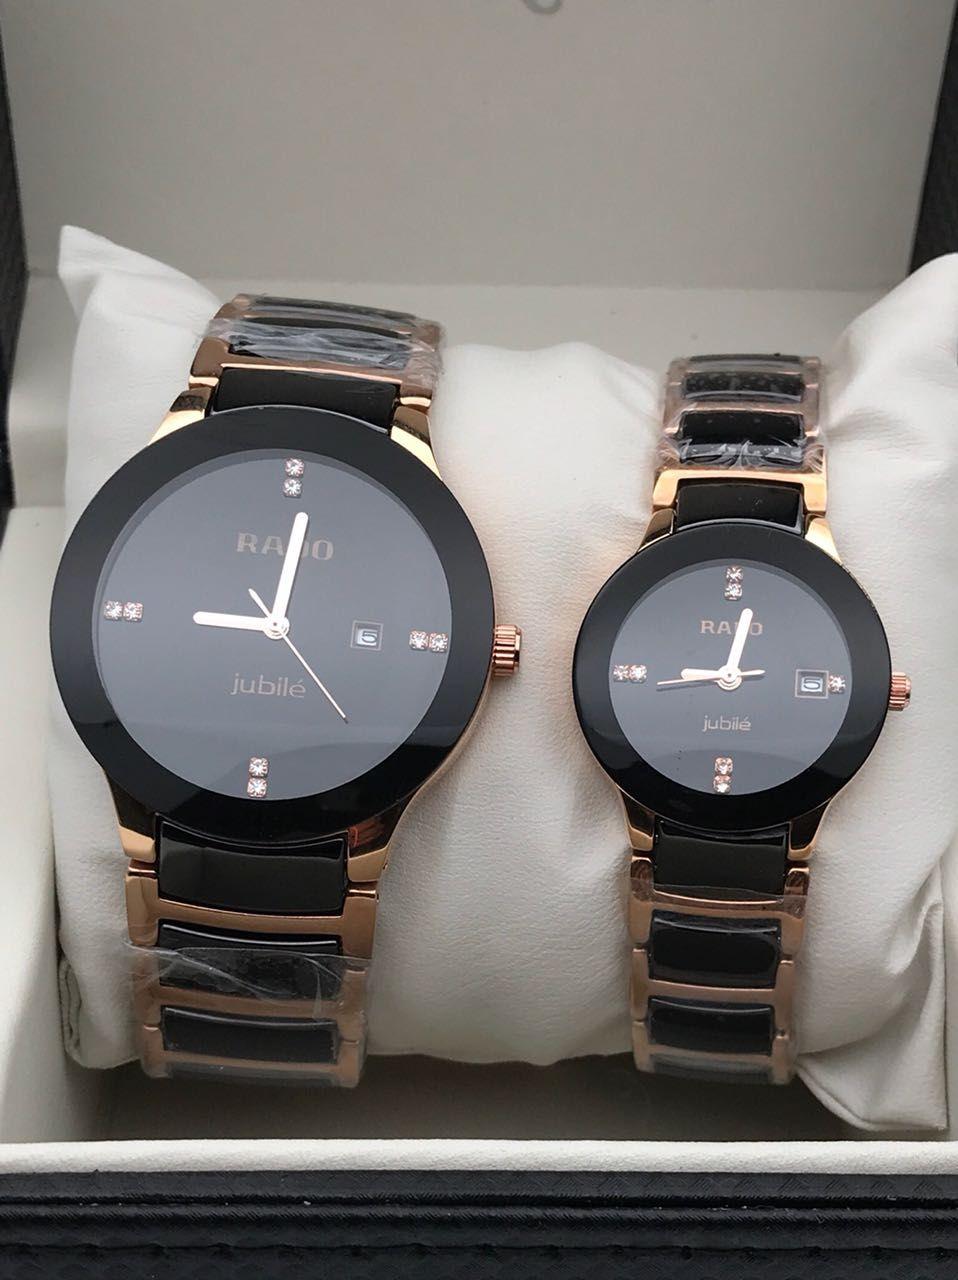 6ced3d14ed RADO JUBLIE Couple Watch Rado Jublie couple watch 1st copy Best Quality  2699/- free